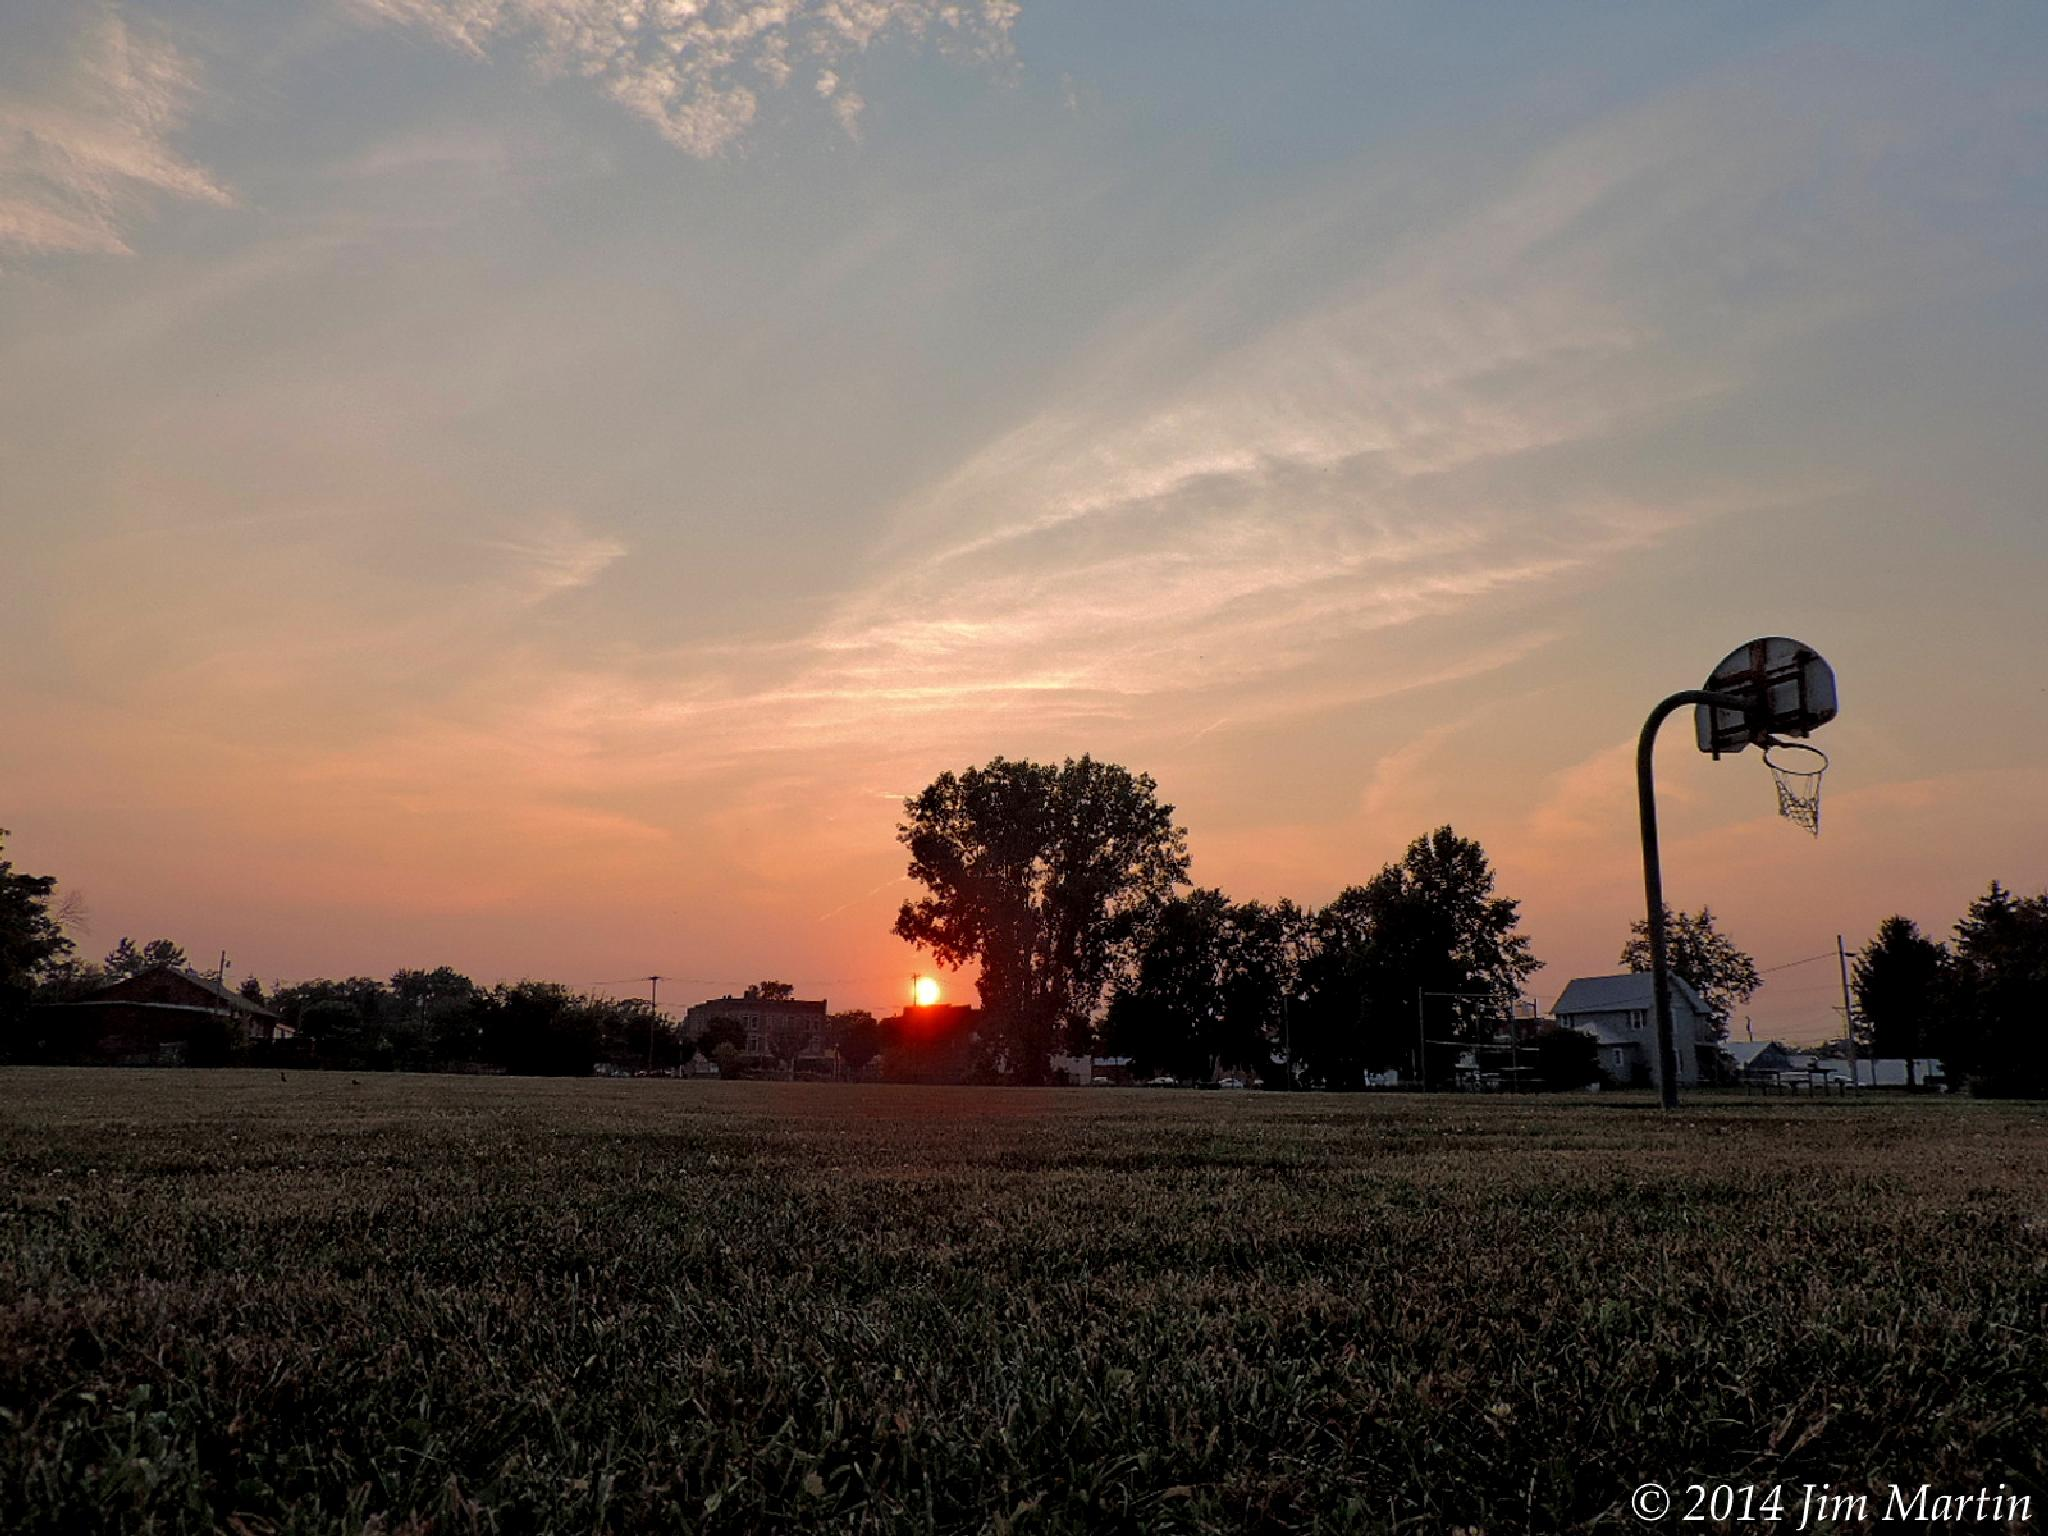 Ground Level Sunset by Jim Martin